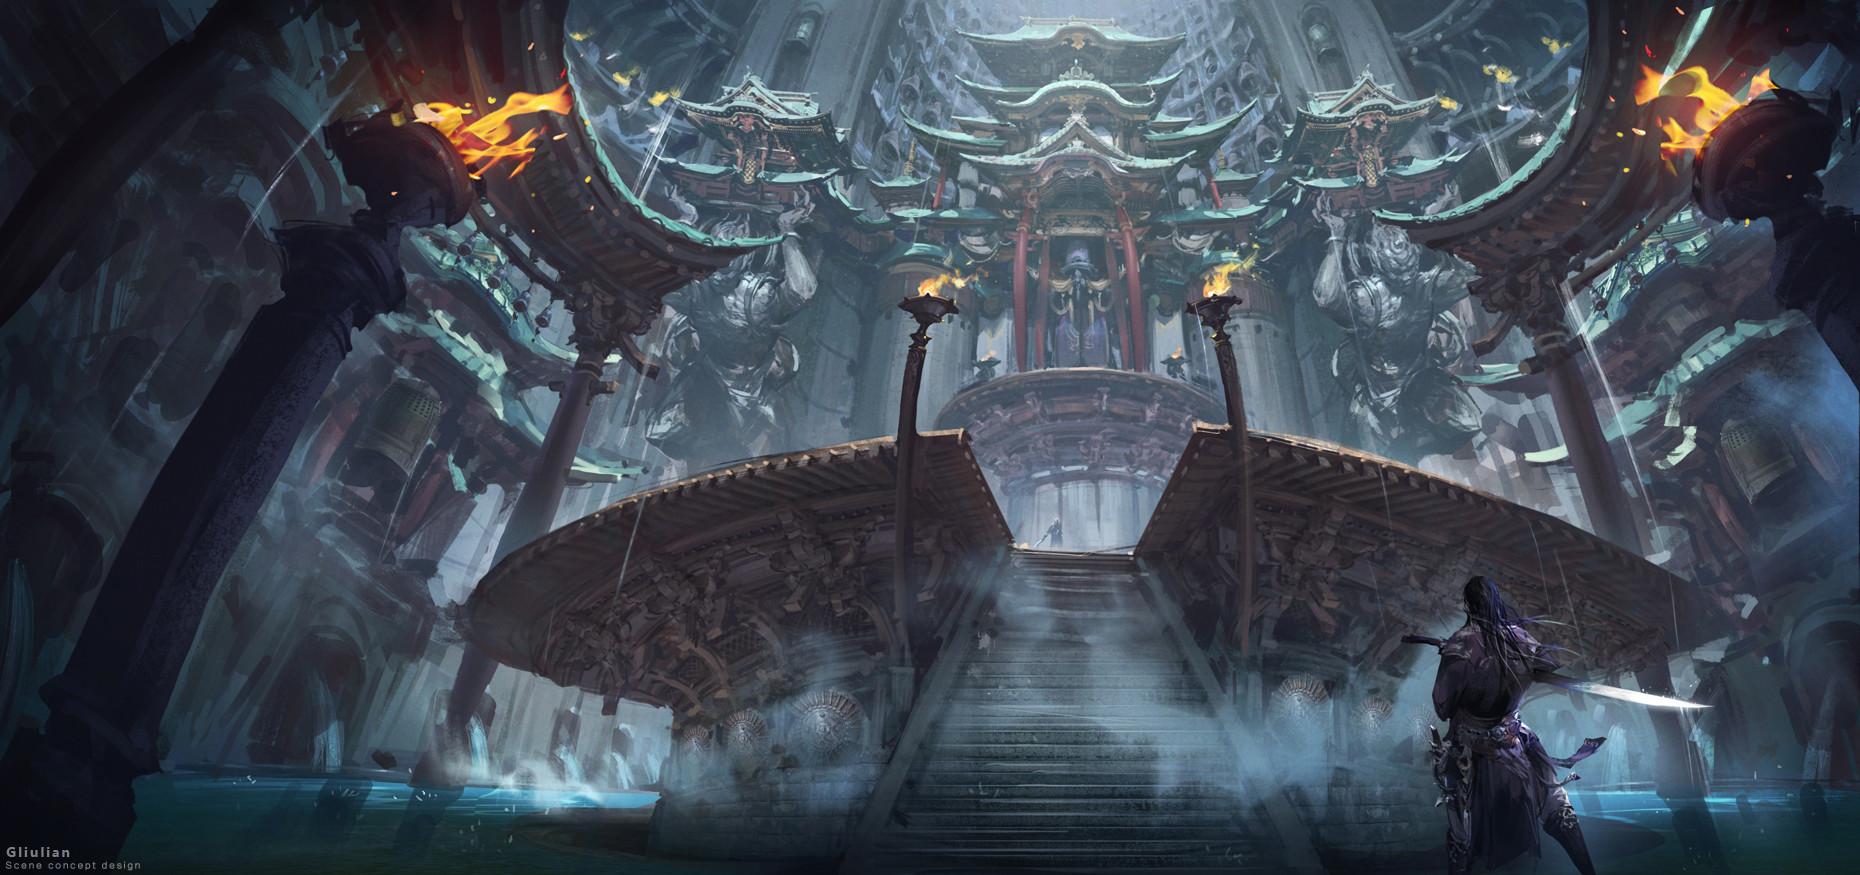 Download Hd Game Wallpapers 1080p Wallpaper Fantasy Art Mist Temple Fire Sword